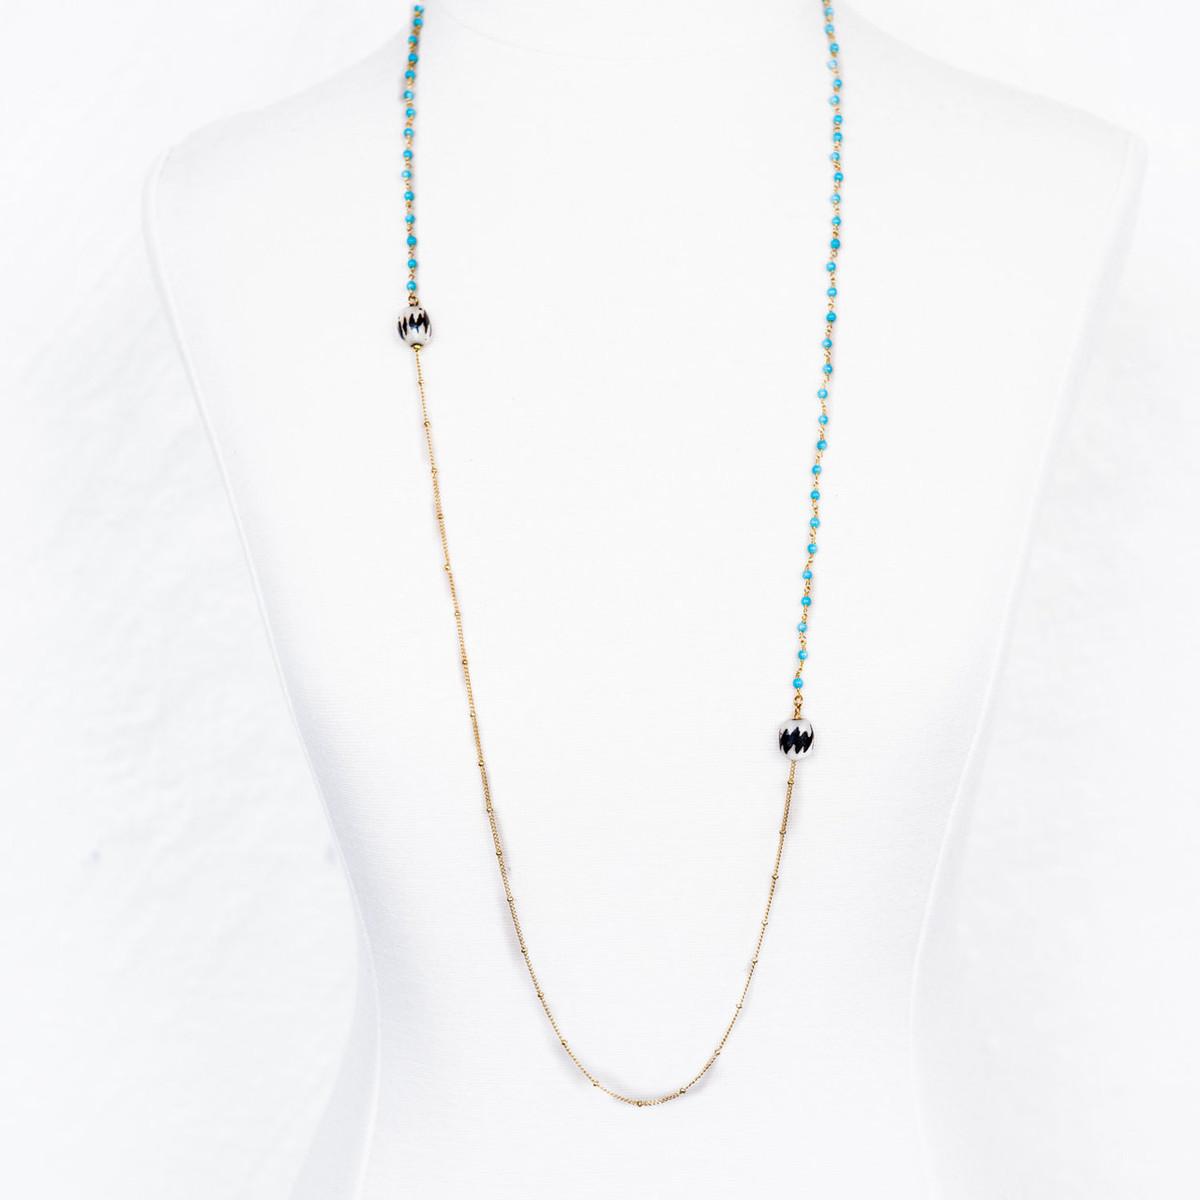 7Stitches Single strand Turquoise Necklace